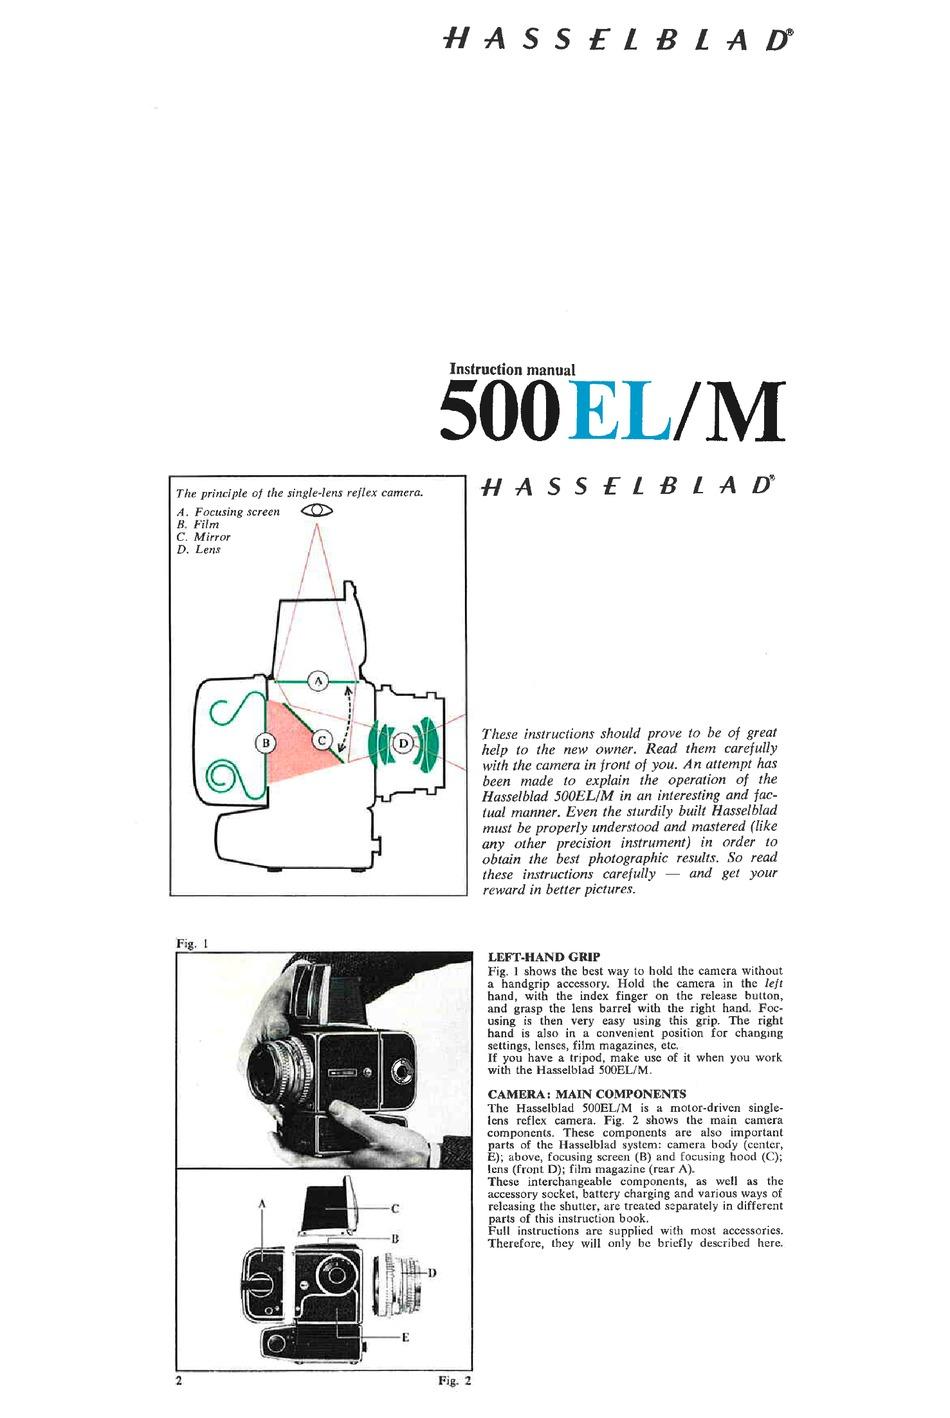 HASSELBLAD 500EL/M INSTRUCTION MANUAL Pdf Download